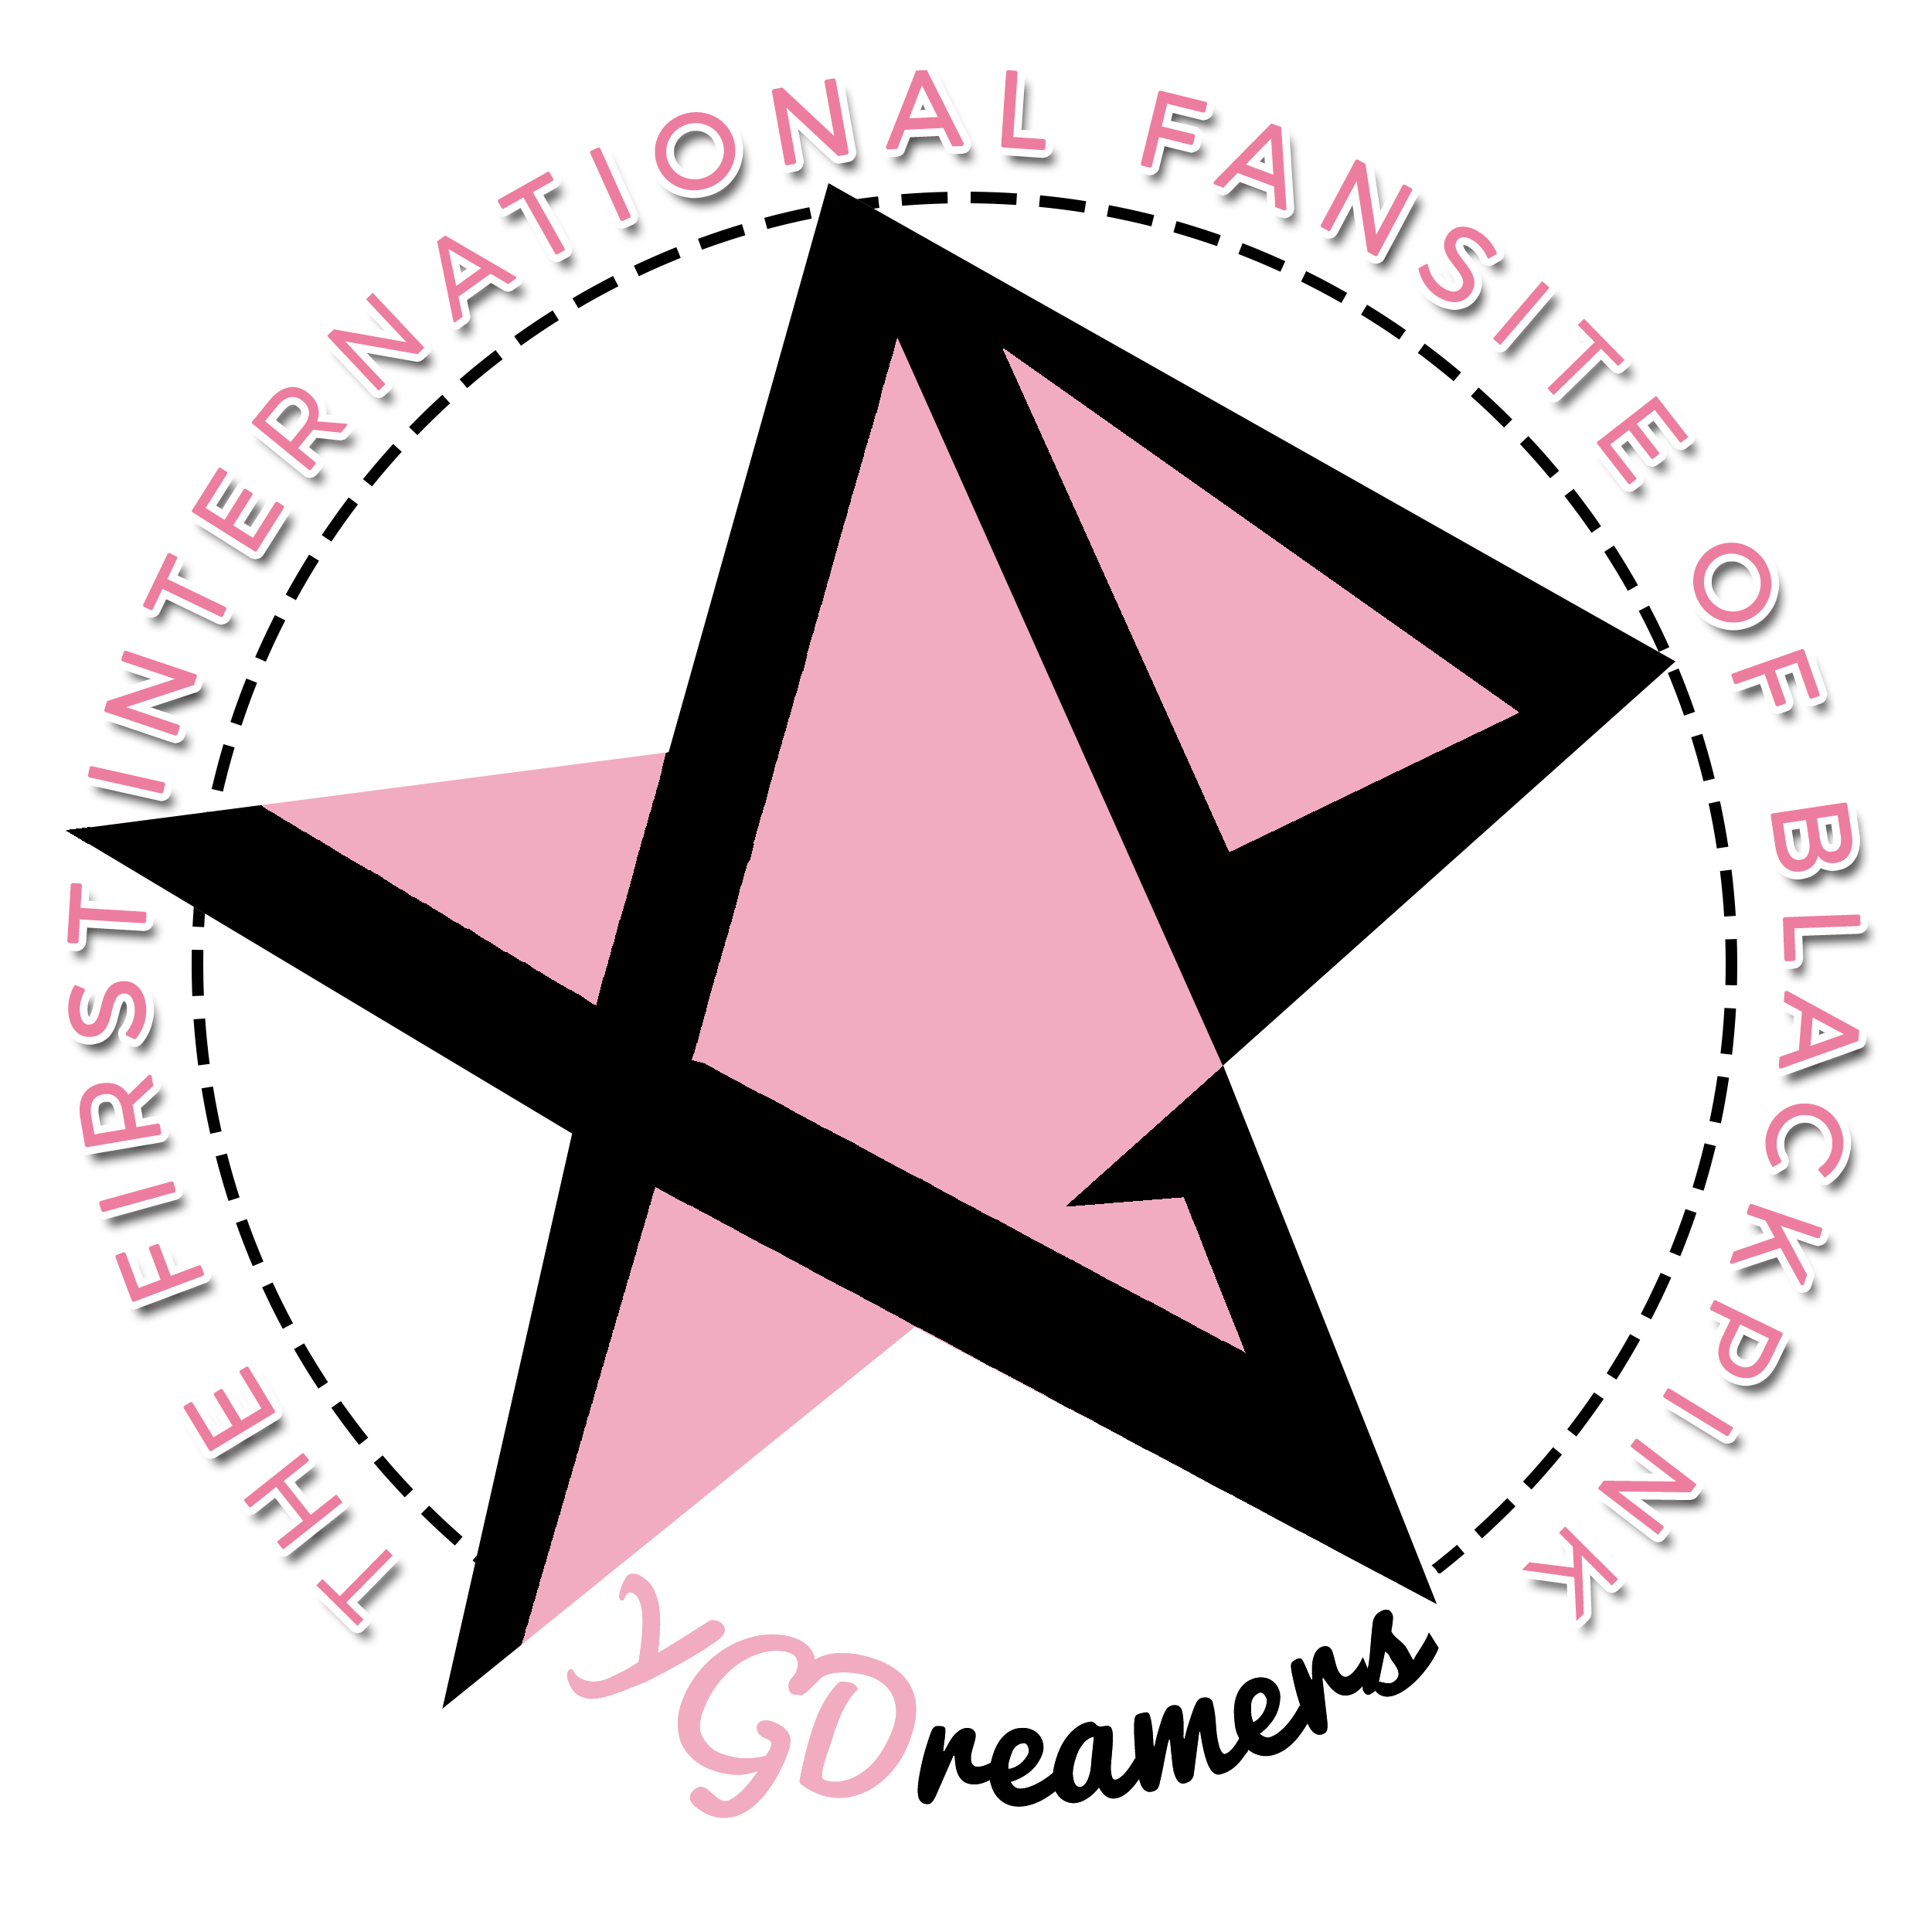 ygdreamers logo